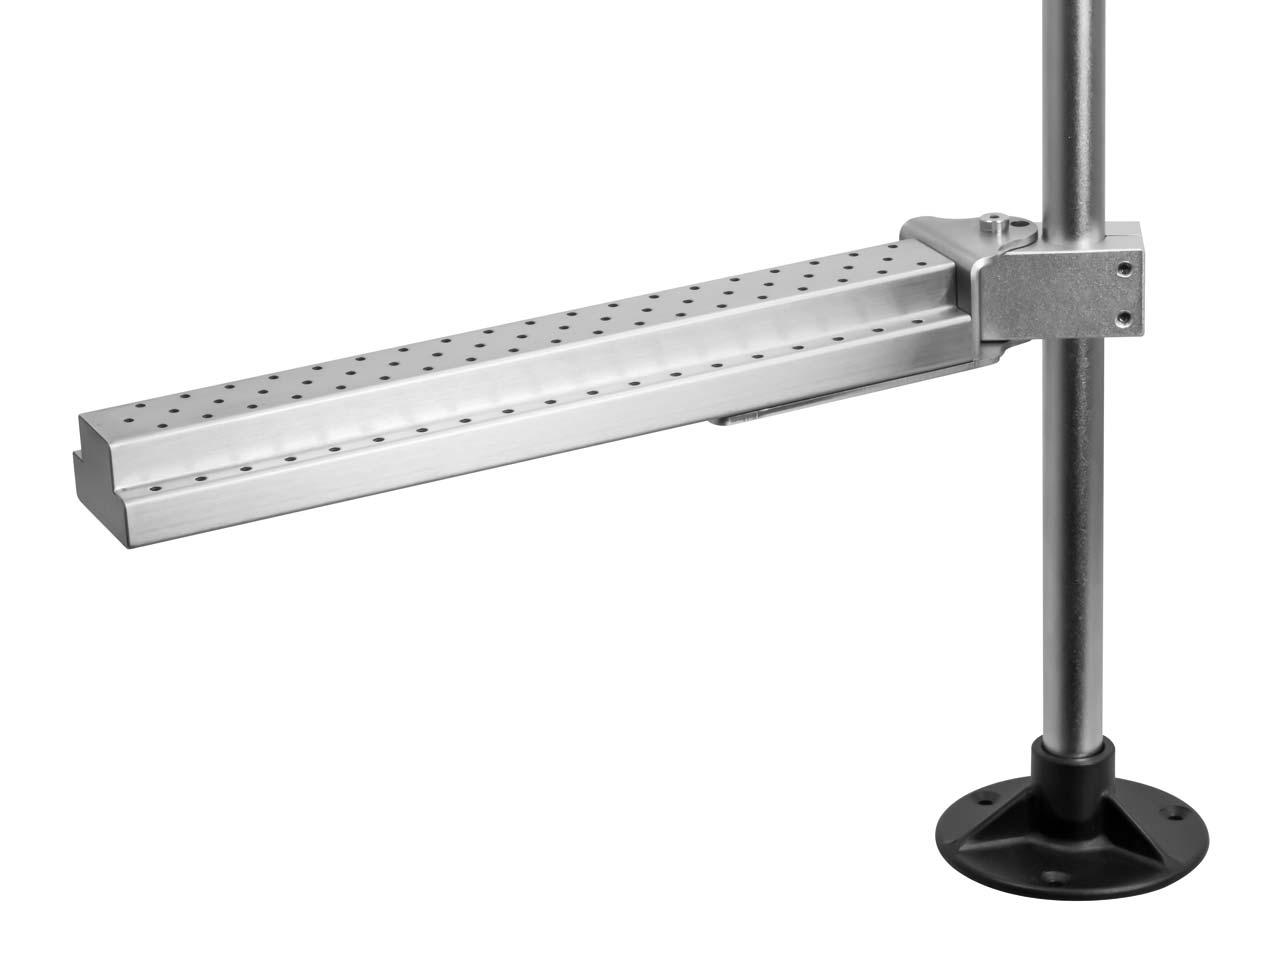 Genuine-US-Foredom-Workbench-Accessories-System miniatura 2